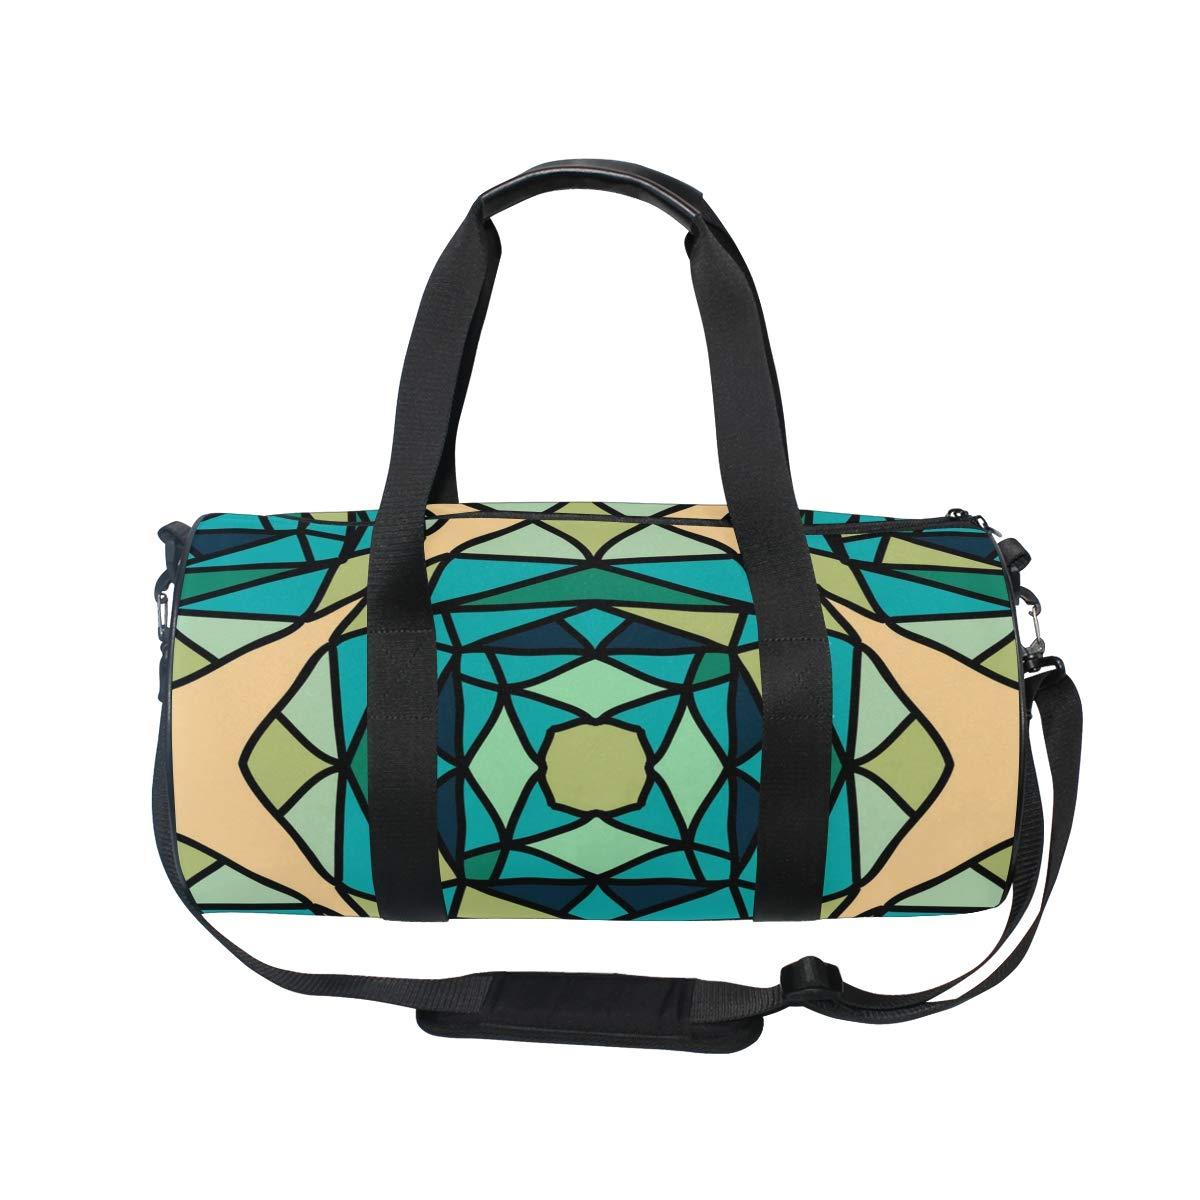 Radiant Ceramic PictureWaterproof Non-Slip Wearable Crossbody Bag fitness bag Shoulder Bag